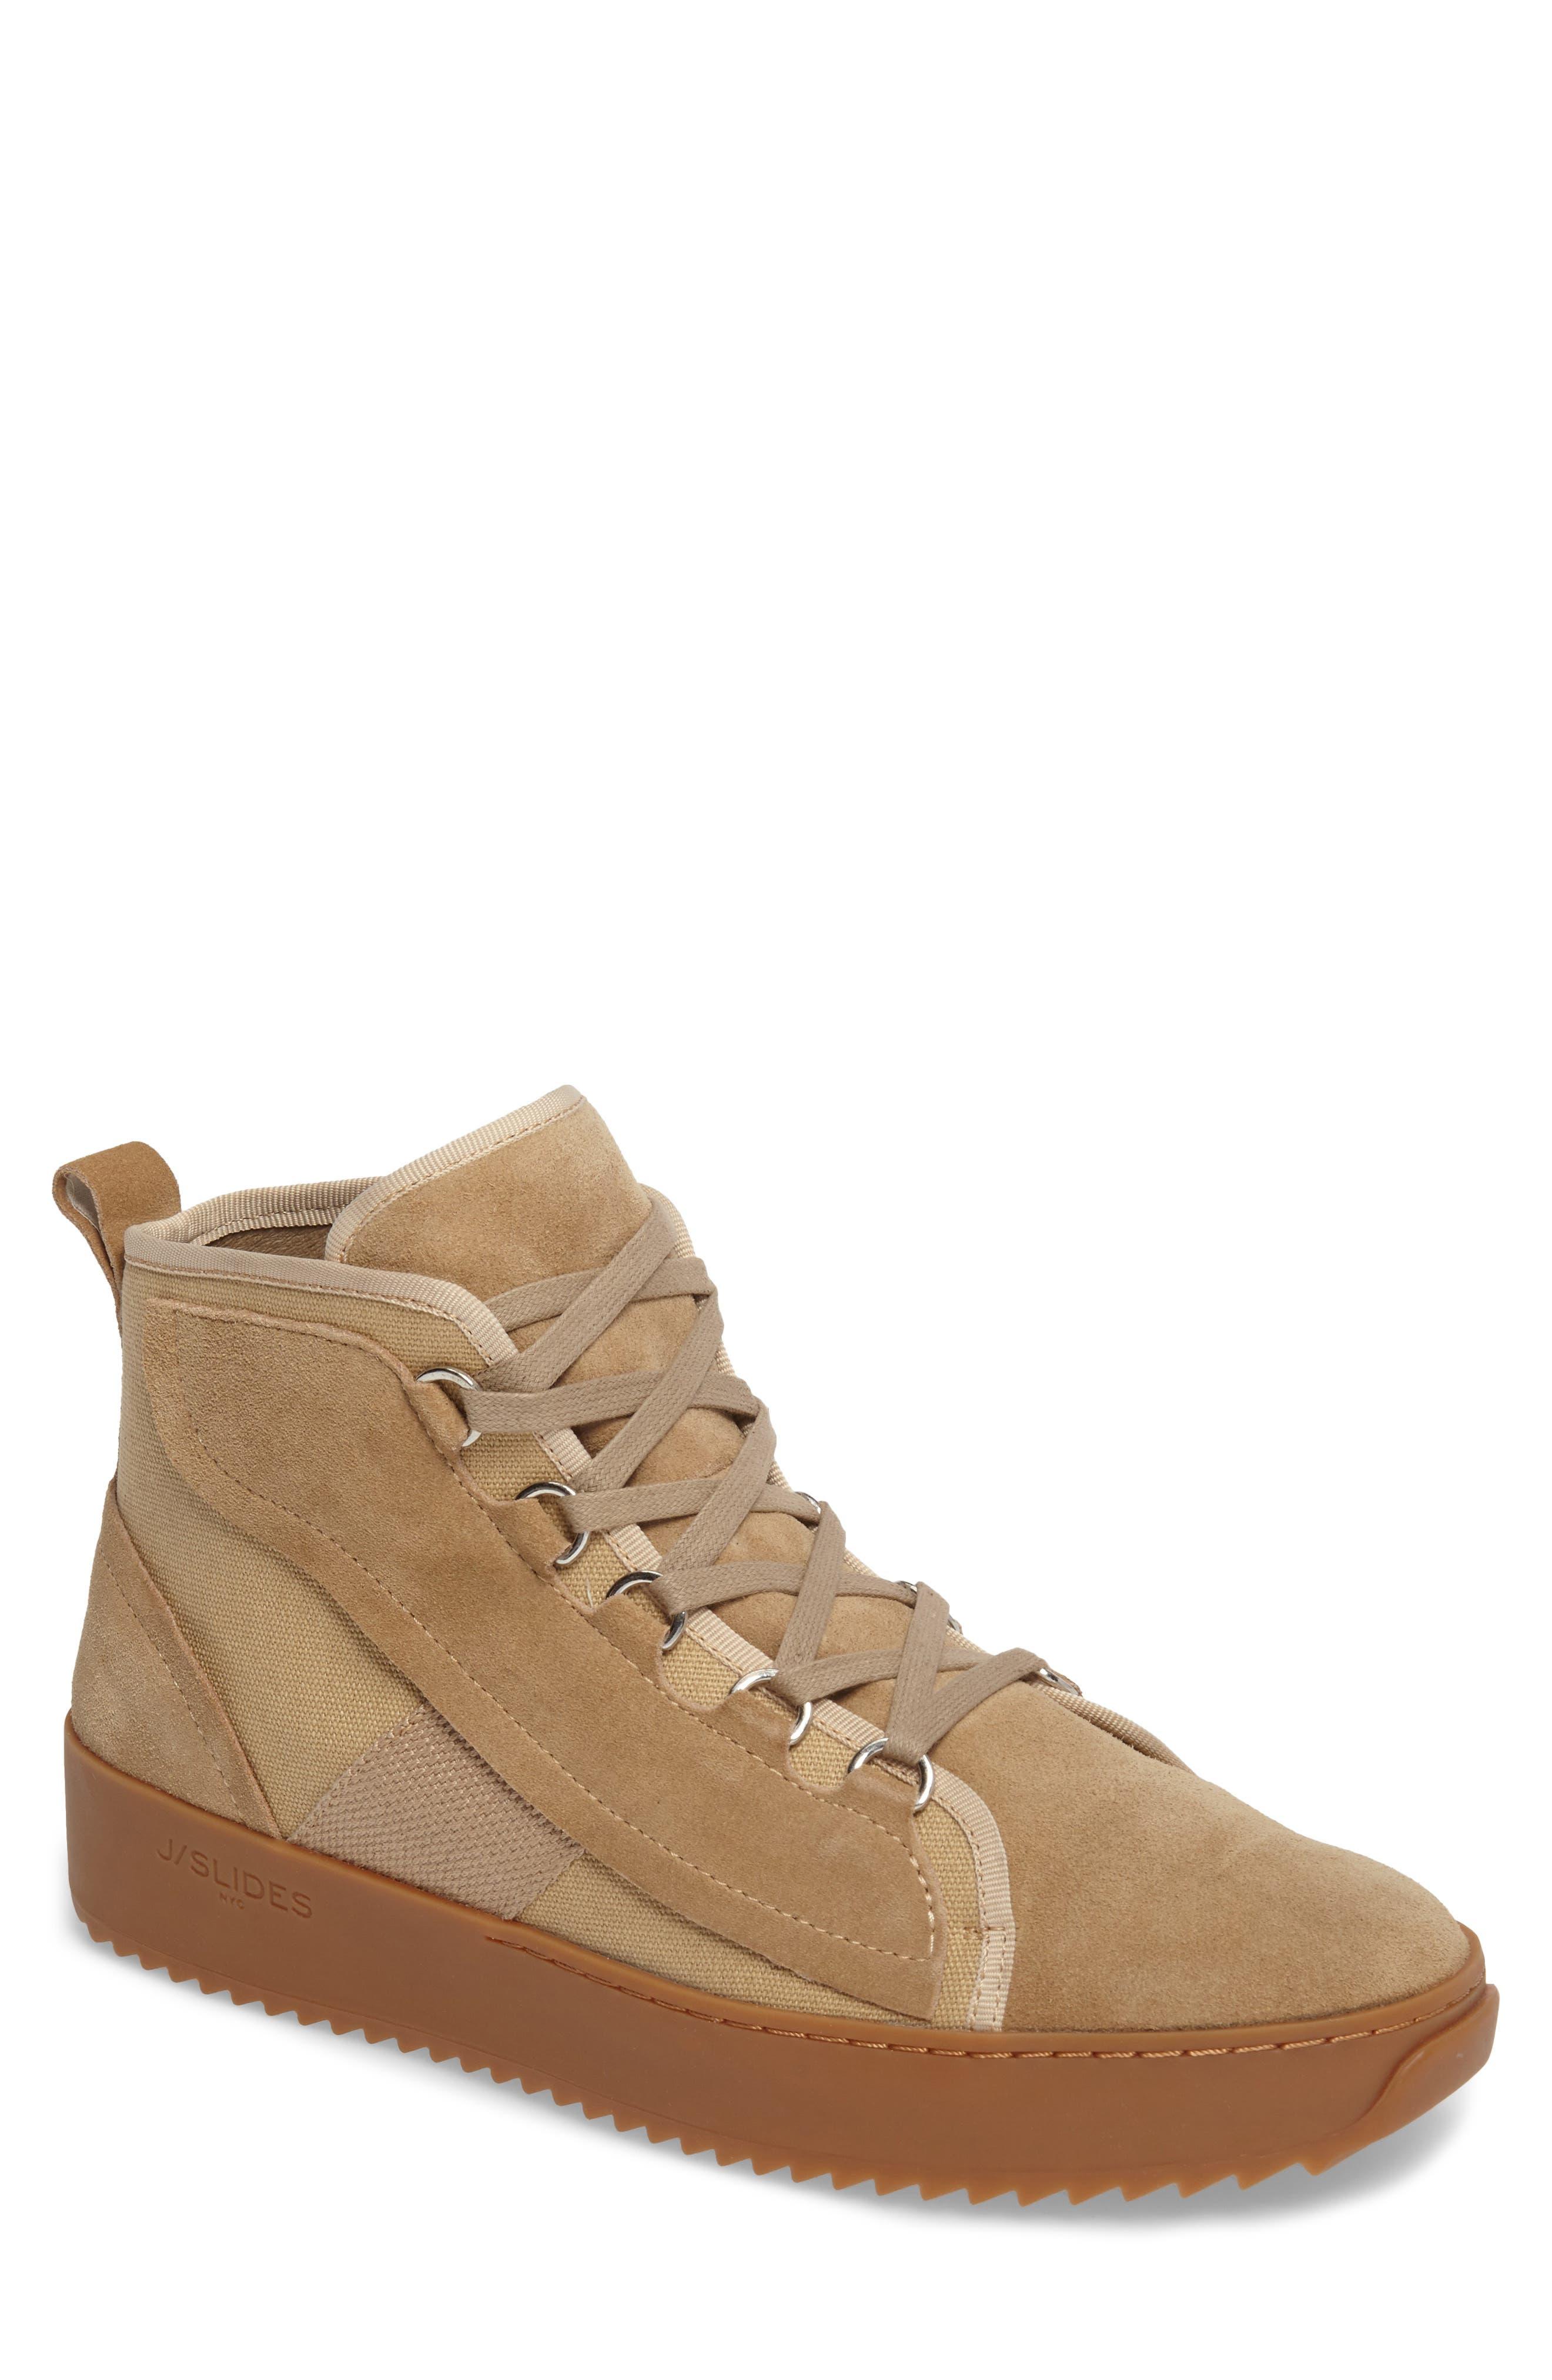 Sander Sneaker,                             Main thumbnail 1, color,                             Sand Suede